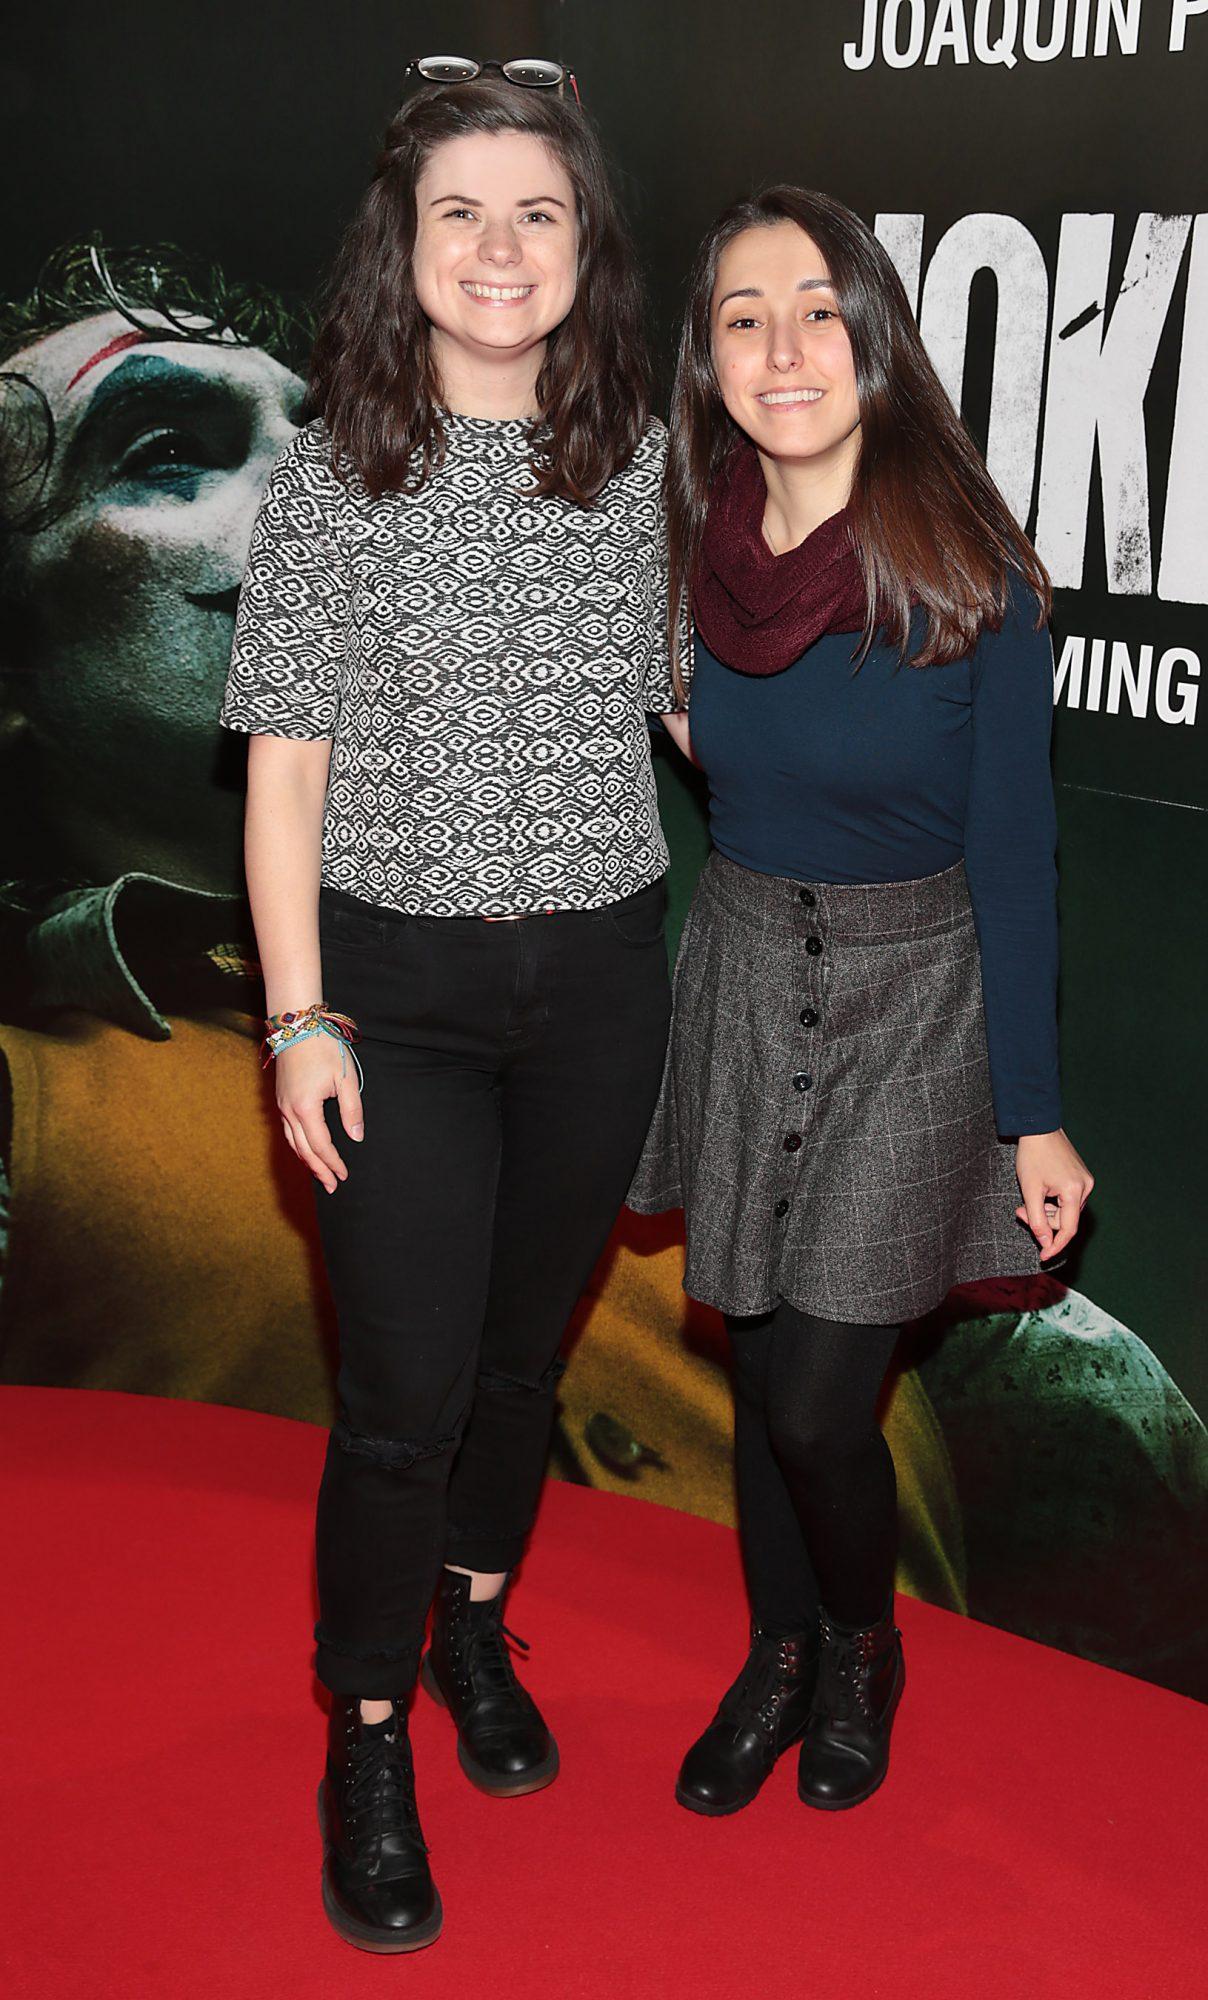 Nadine West and Tahlyta da Marte at the Irish Premiere screening of Joker at Cineworld, Dublin. Pic: Brian McEvoy.